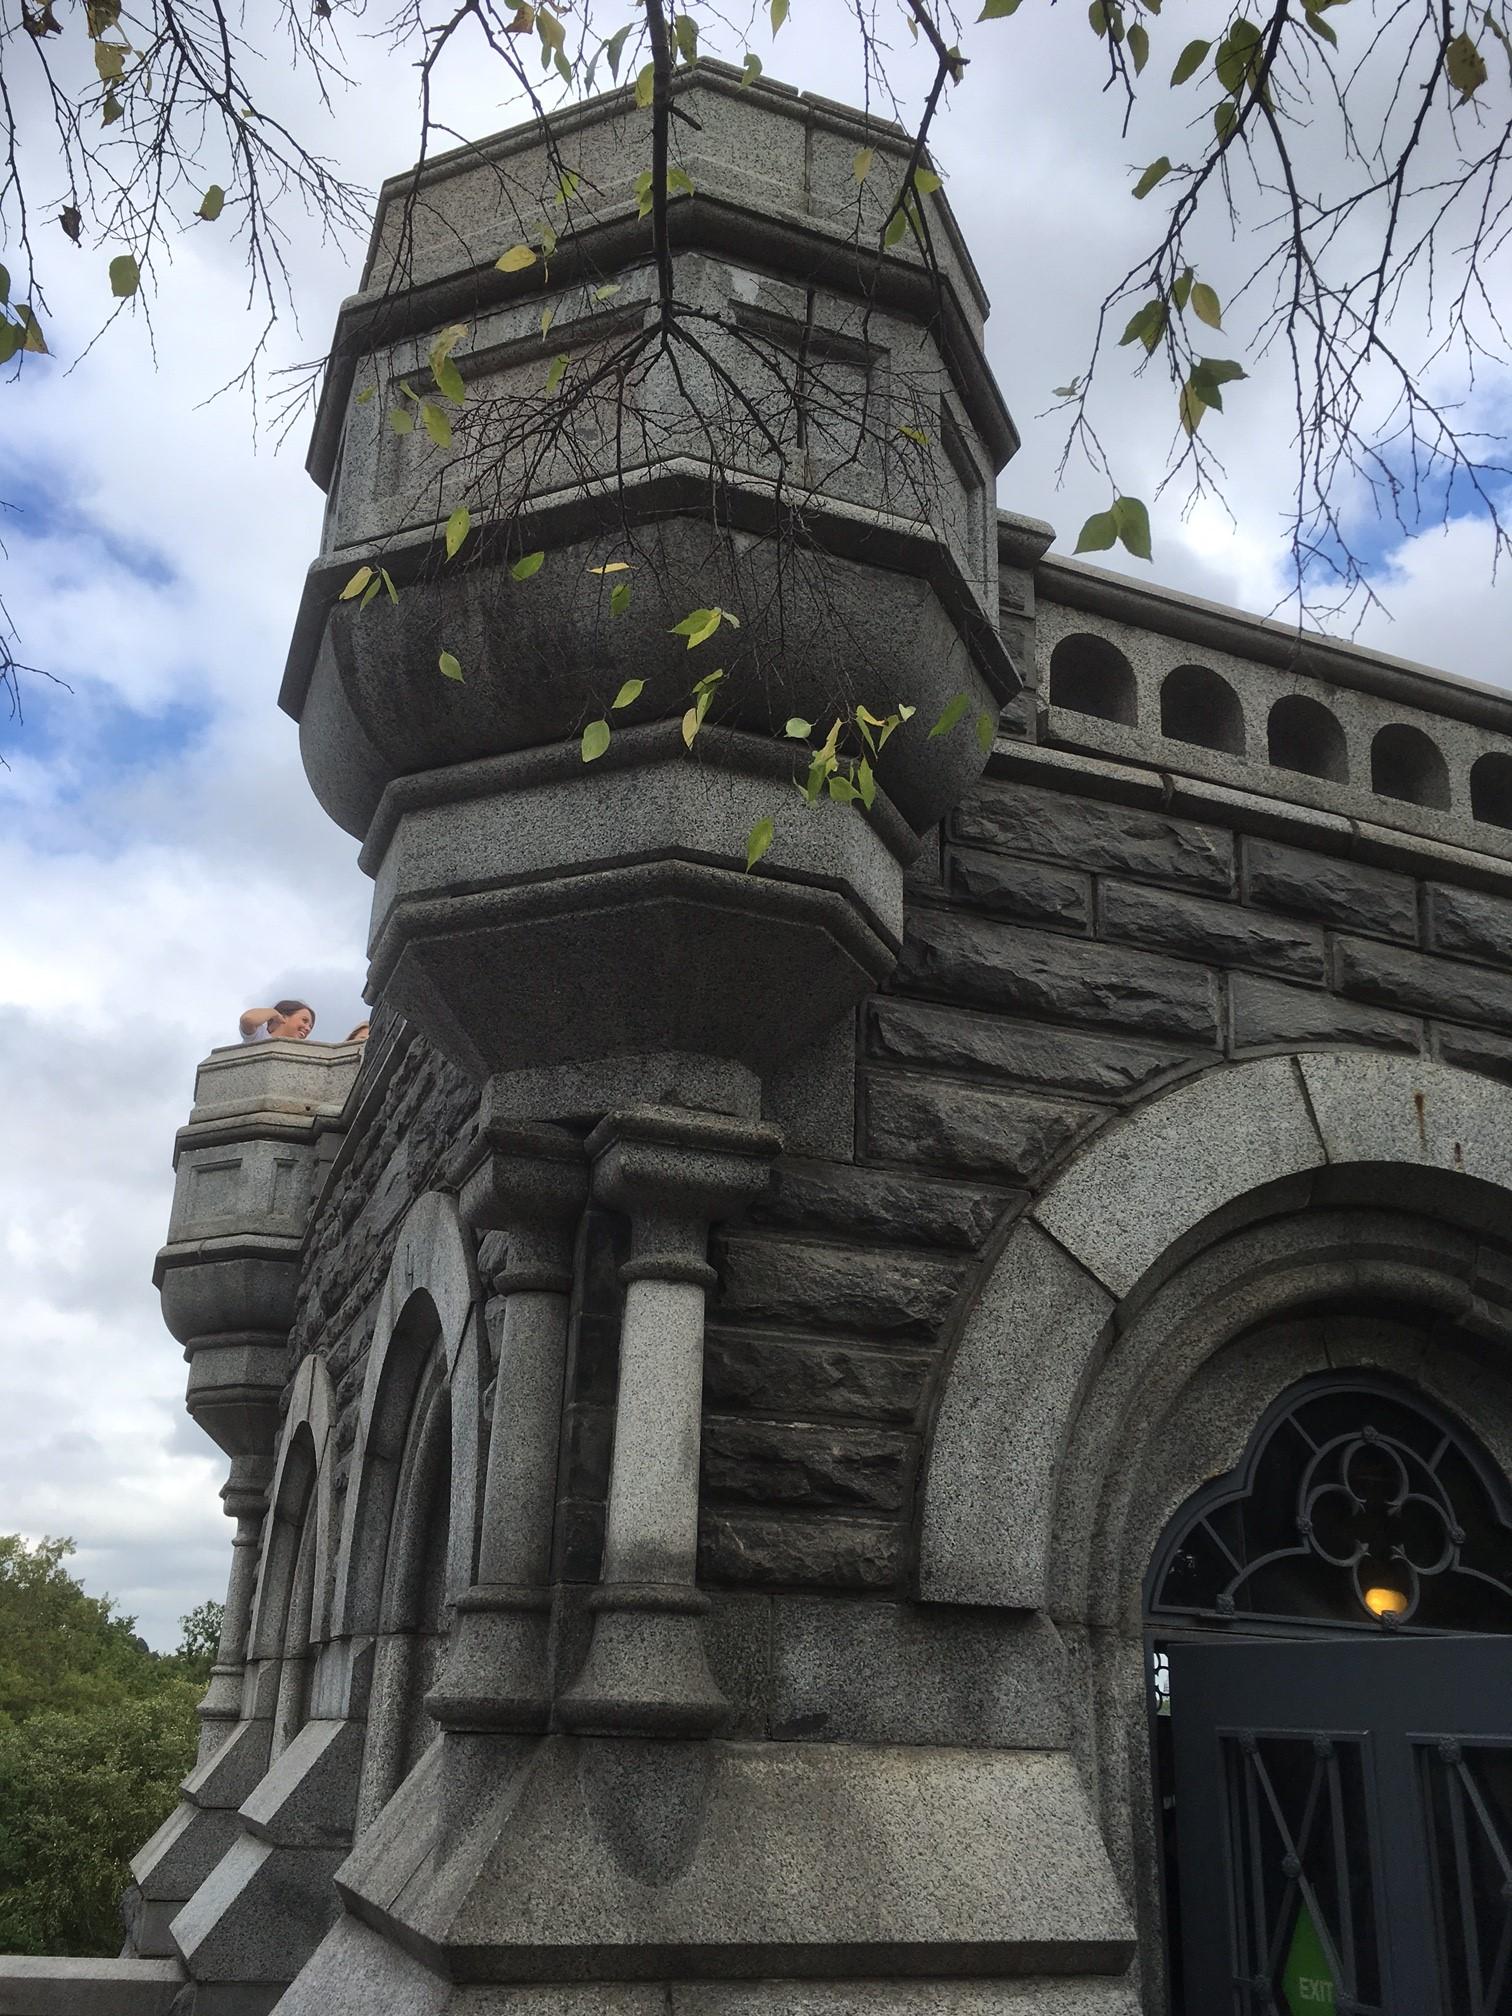 Belvedere Castle, Central Park